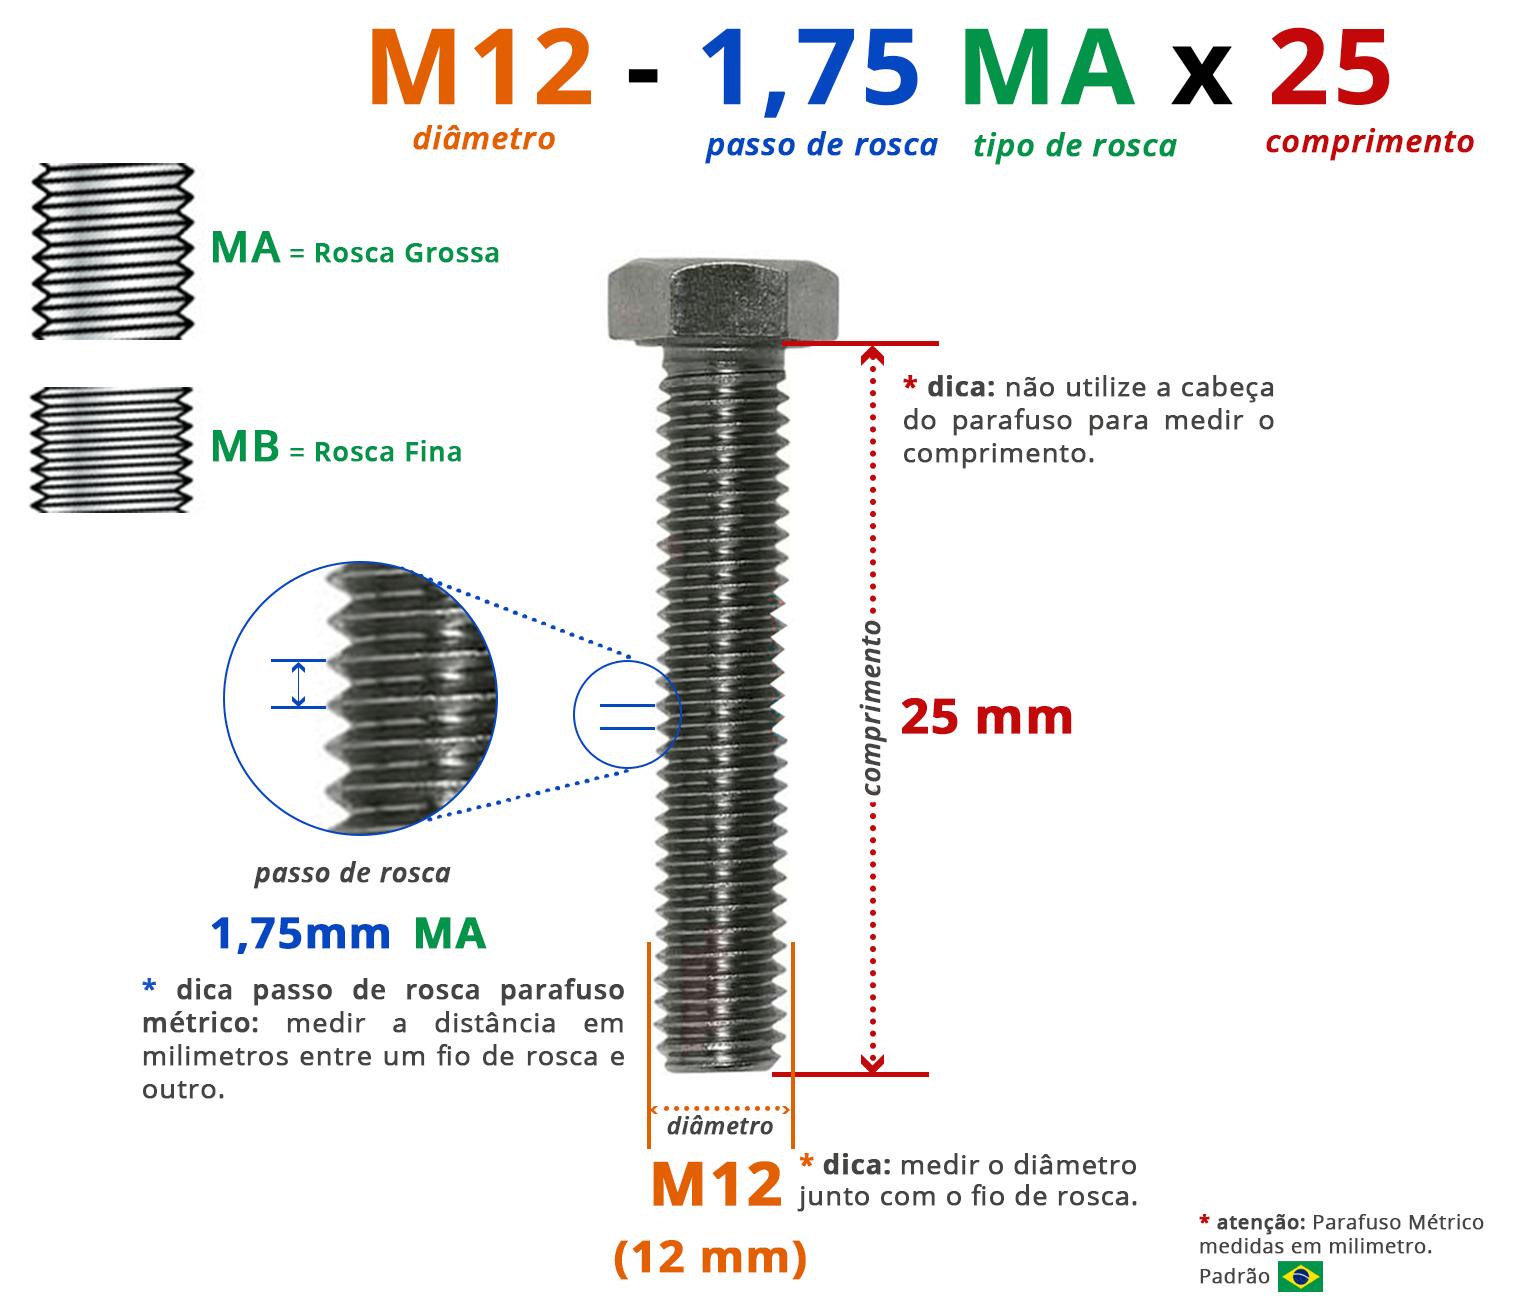 PARAFUSO SEXTAVADO ROSCA INTEIRA M12 1,75 MA X 25 DIN 933 INOX A4